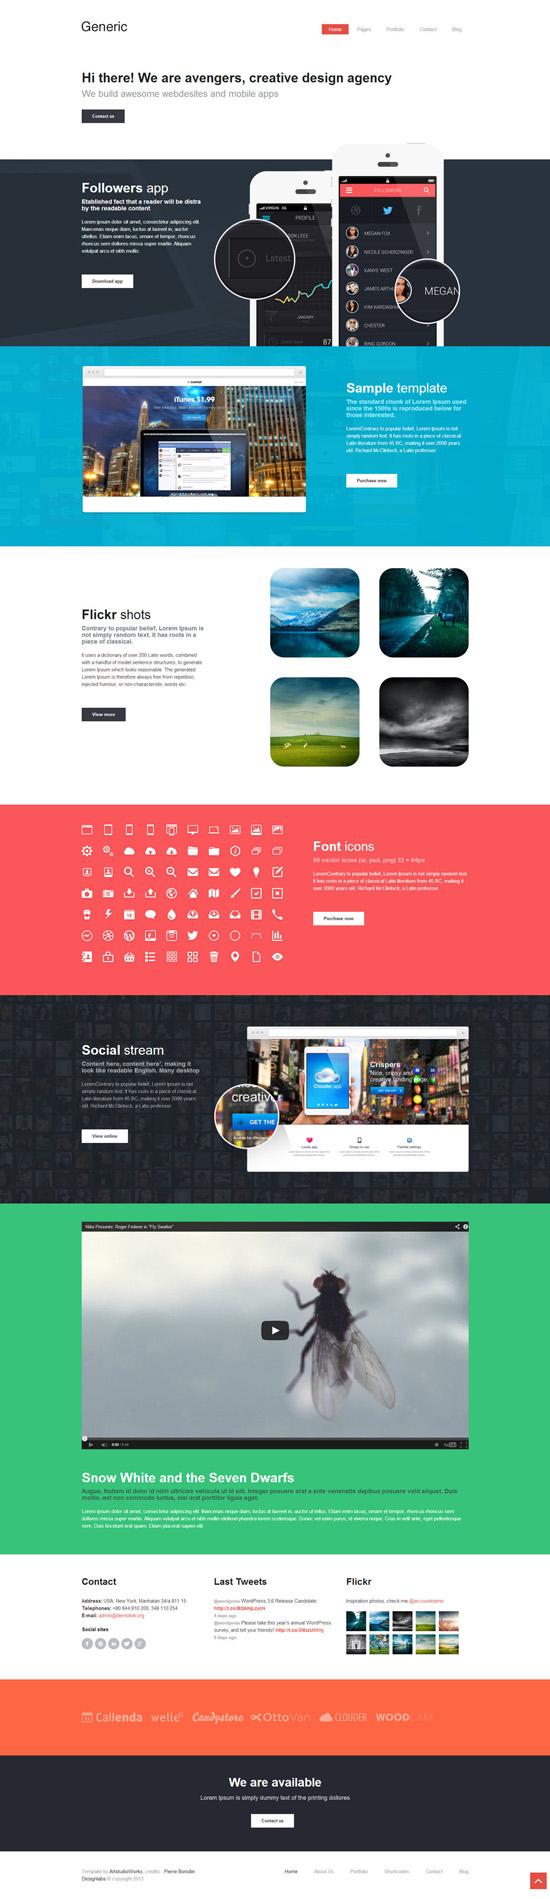 Generic - Unique Flat WordPress Theme